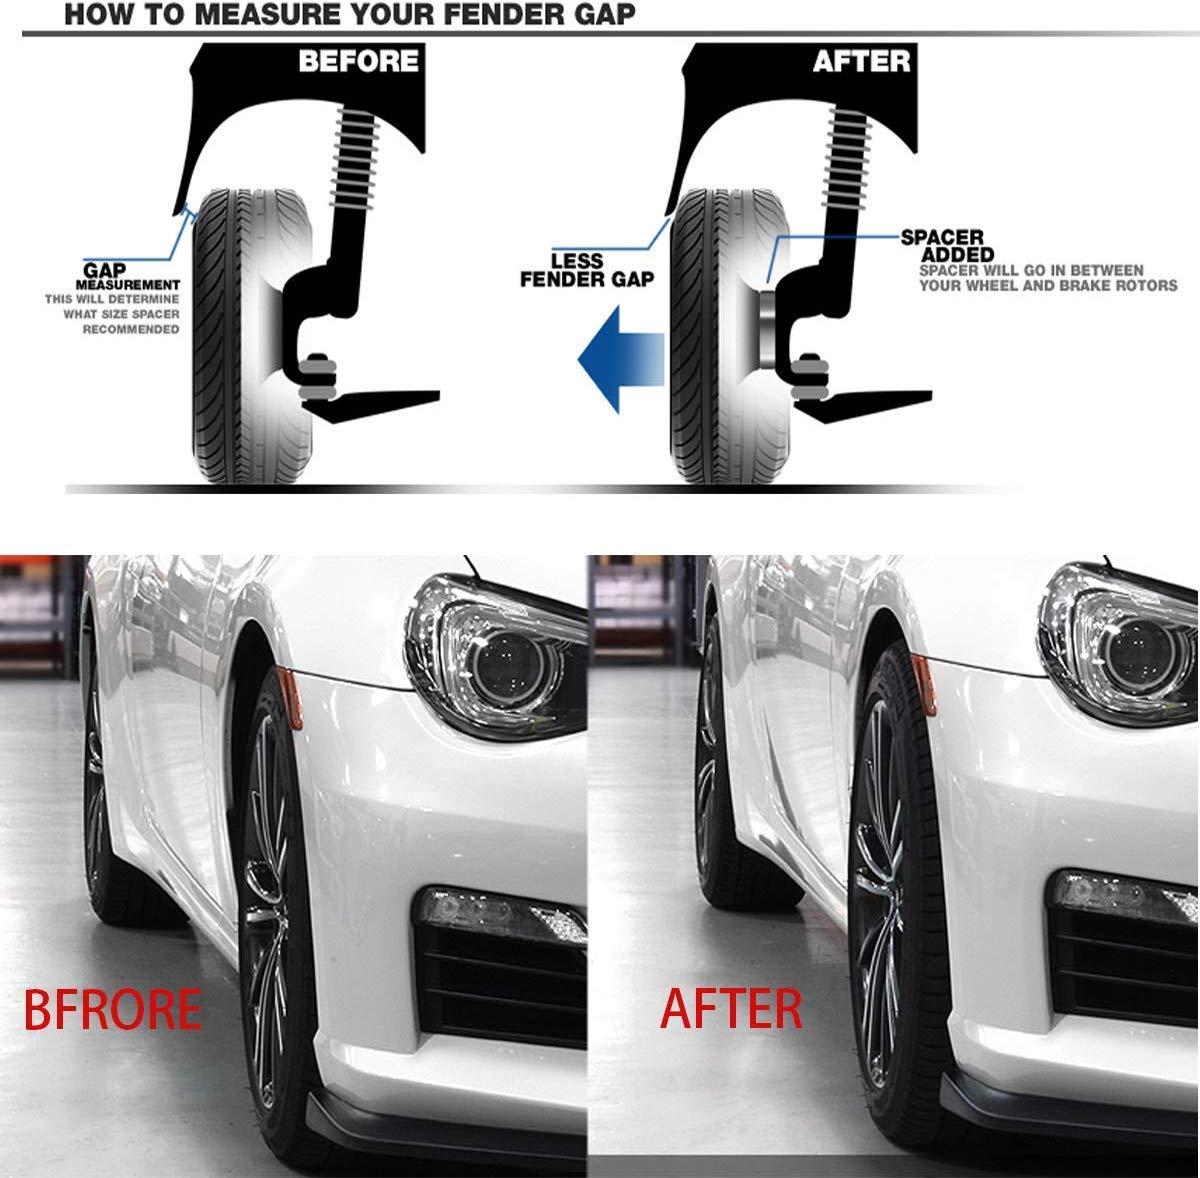 KSP 5X120mm Wheel Spacers for BMW 2PCS 12mm Hubcentric Forged Tuning Spacer for BMW E36 E46 E90 E92 E60 318i 323i 325i 328i 330i 335i 525i 545i Thread Pitch M12x1.5 Hub Bore 72.56mm